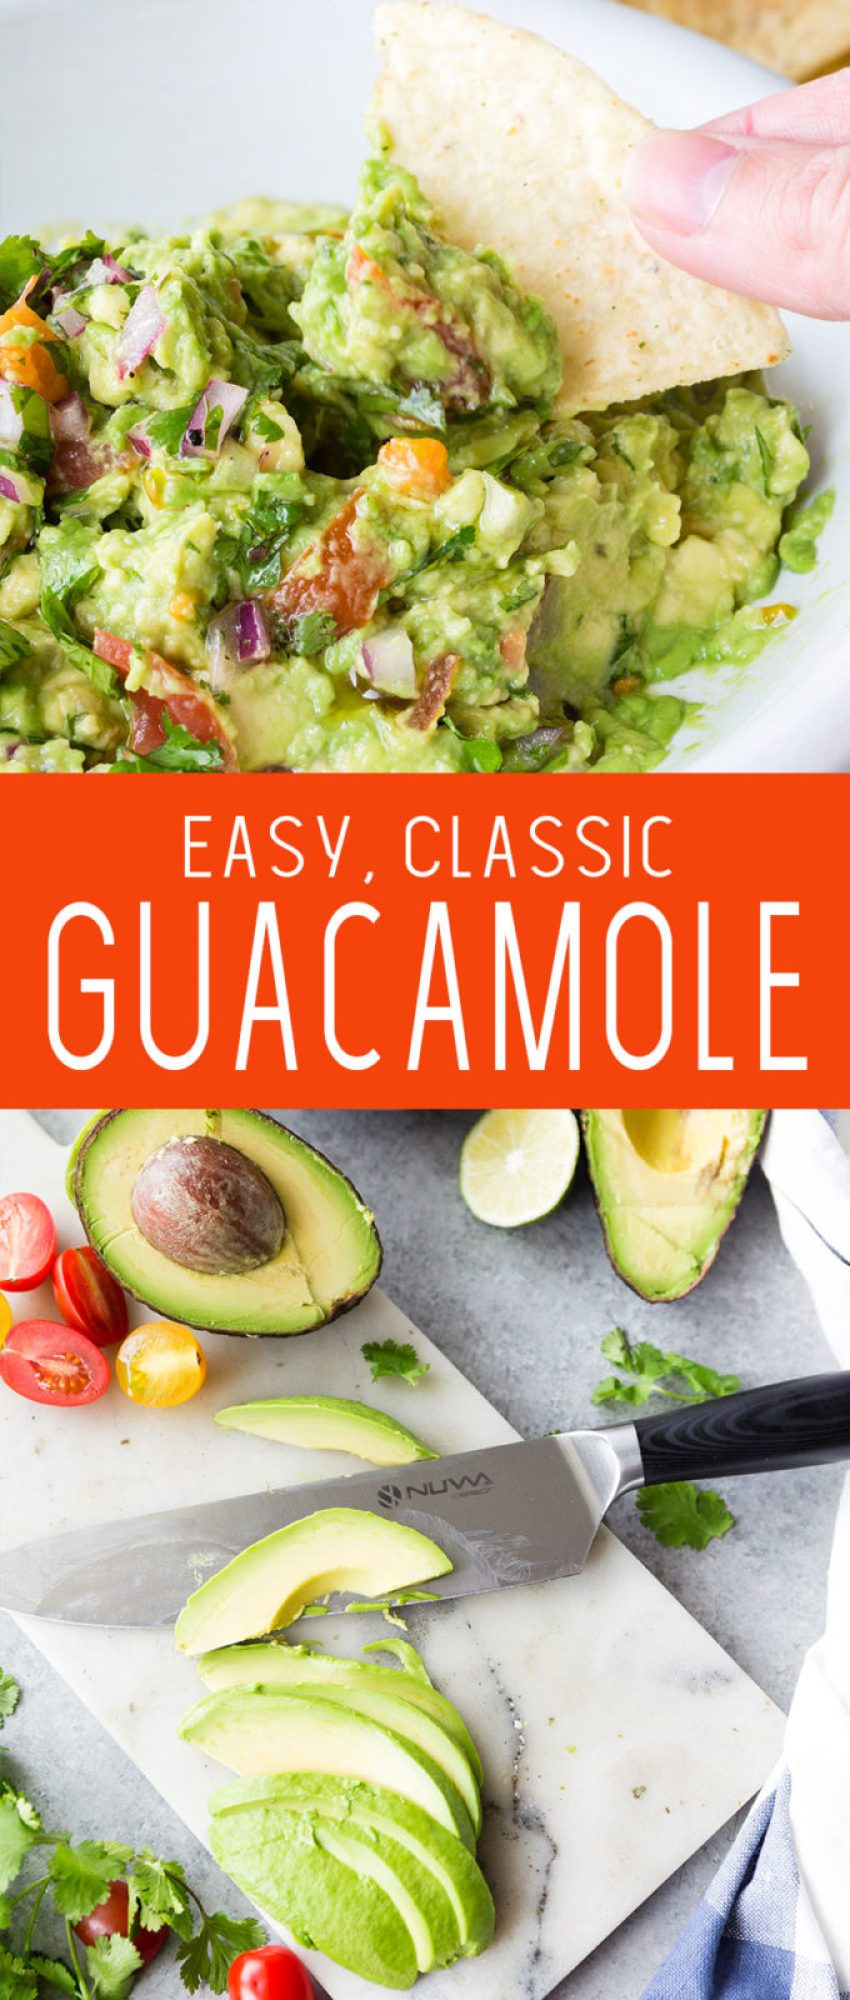 Easy Classic Guacamole, this Guacamole is made with delicious avocado, cilantro, and onion.